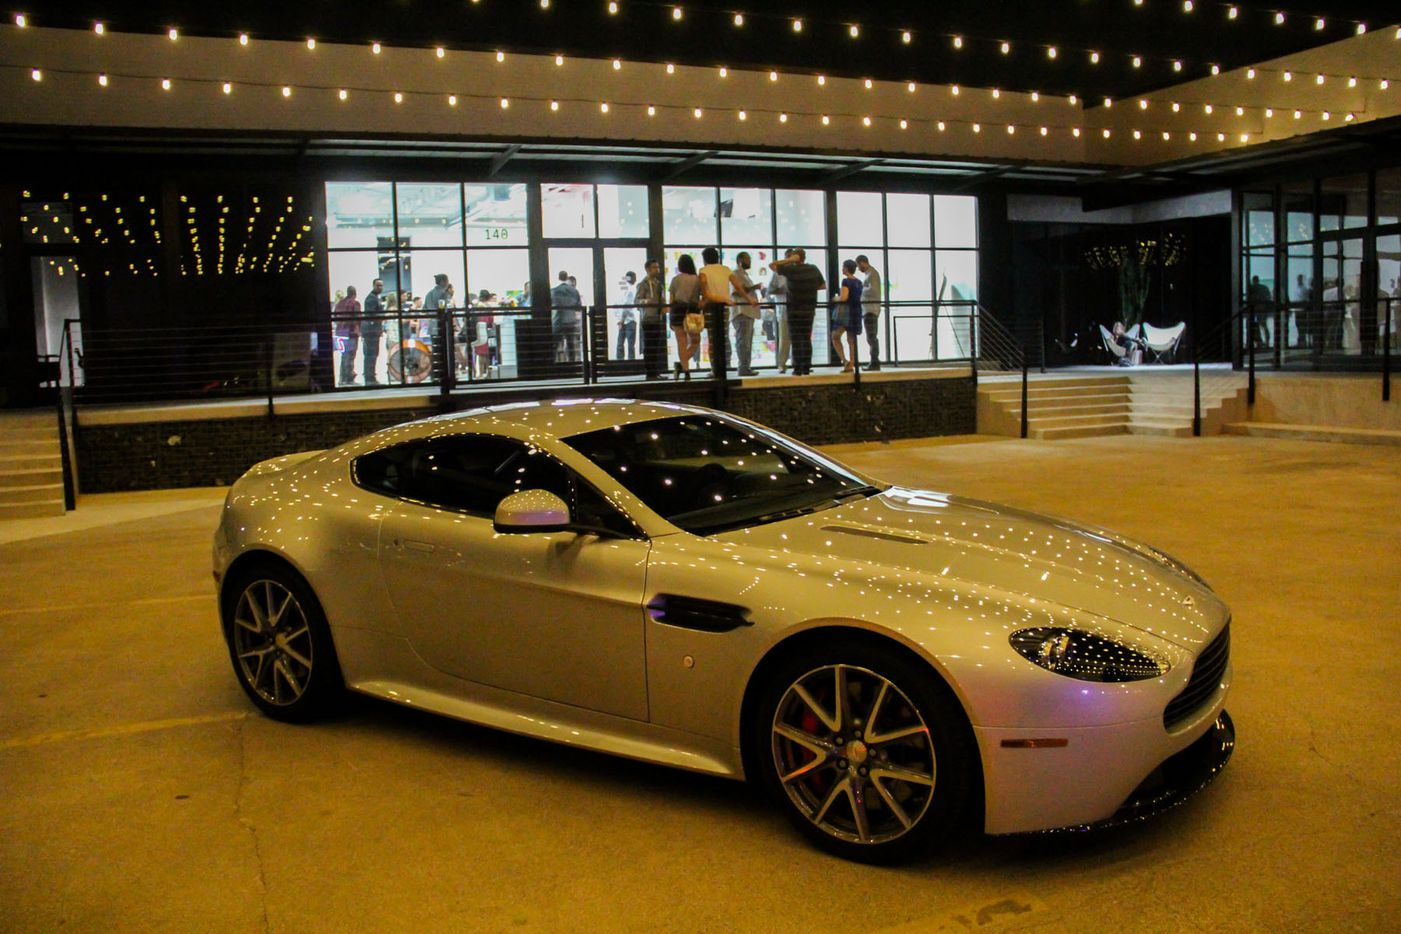 Aston Martin displayed their latest cars at the Random Art Gallery  opening reception of visual artist Tori Martin's Euphoria.